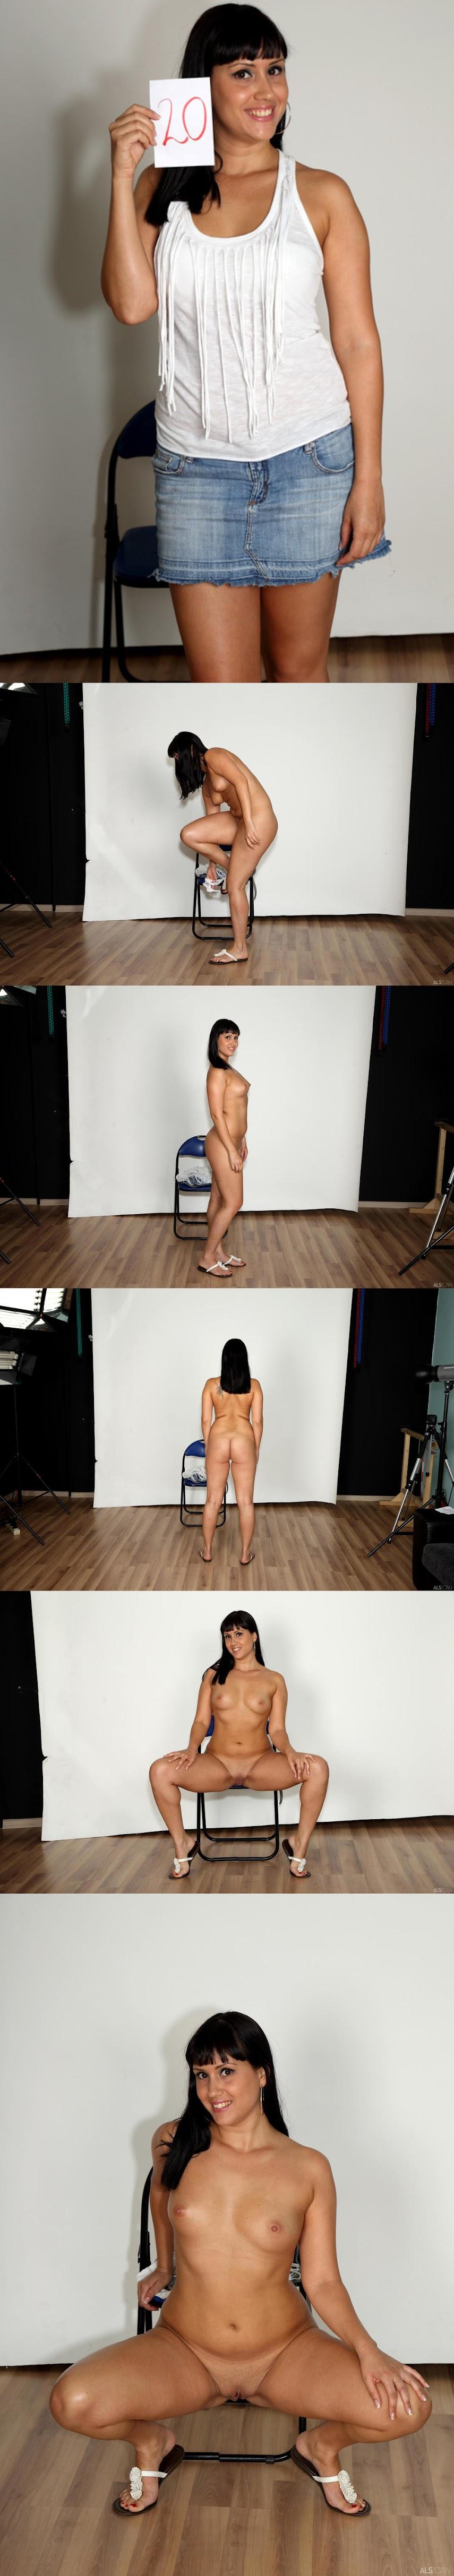 Debriz  2013-06-06 MODEL-20-DIANA-D-by-ALS-PHOTOGRAPHER 5e0b2 high